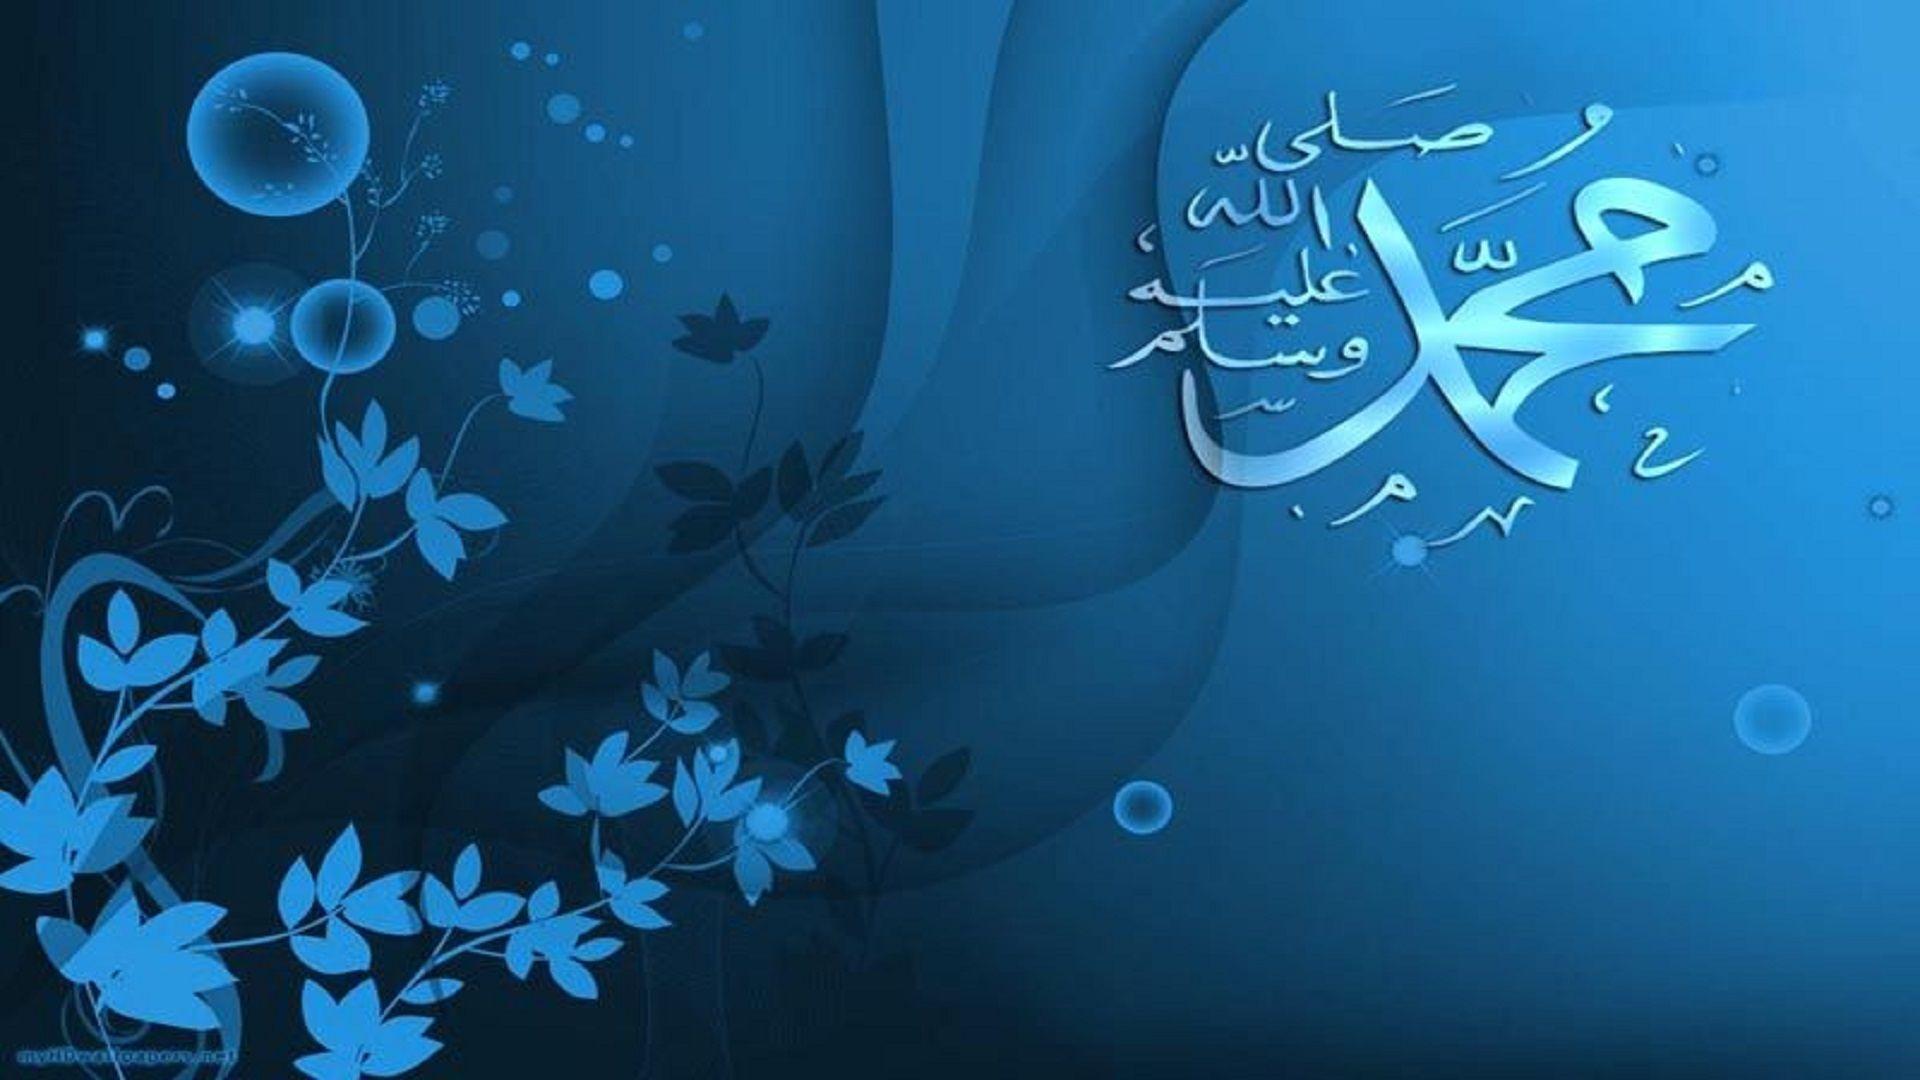 Allah Muhammad Wallpapers Wallpaper Cave